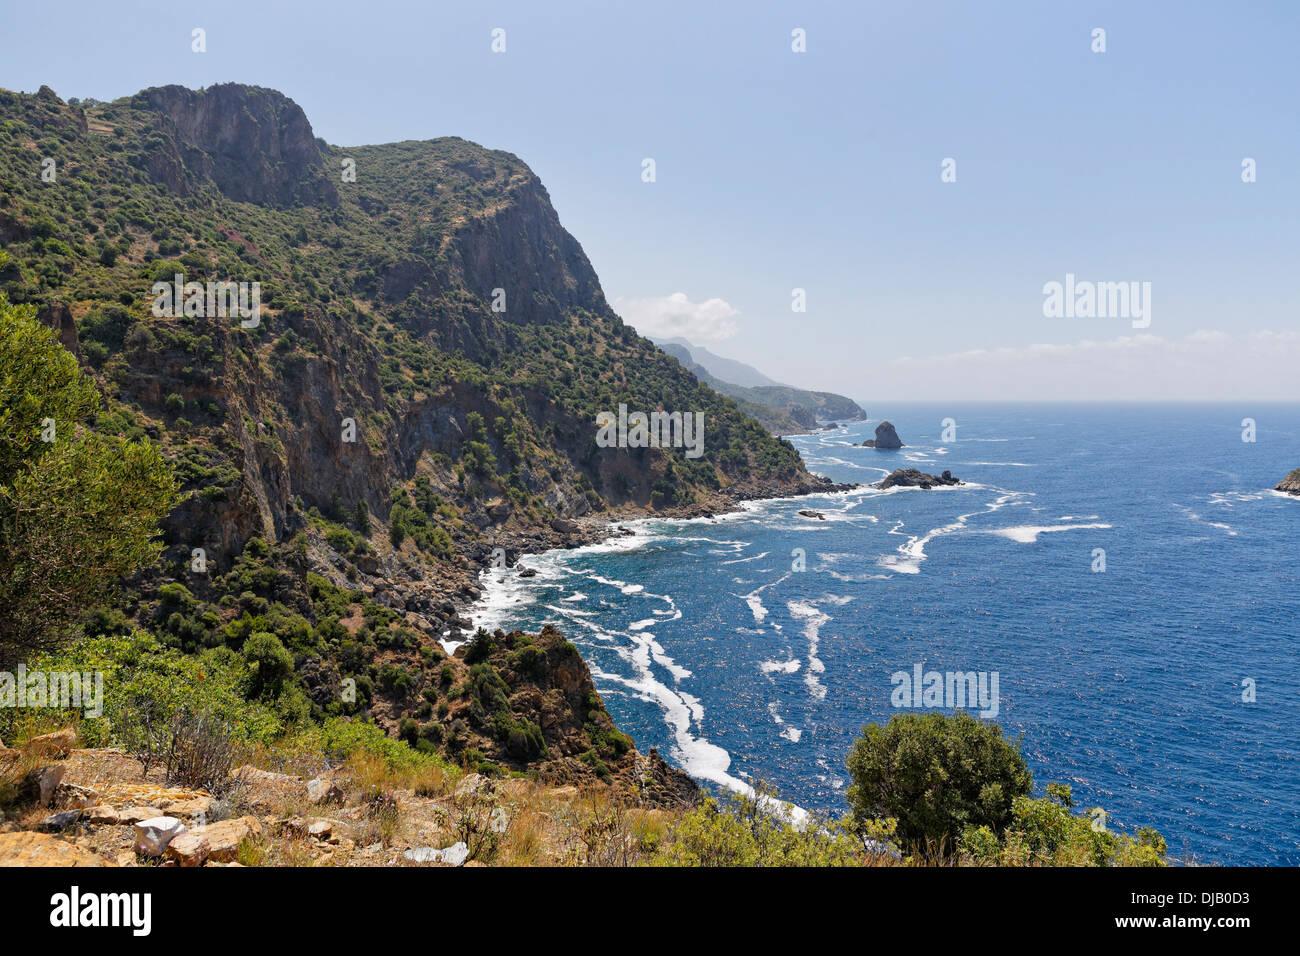 Antiochia ad Cragum, Gazipasa, provincia di Antalya, Riviera Turca, Turchia Immagini Stock